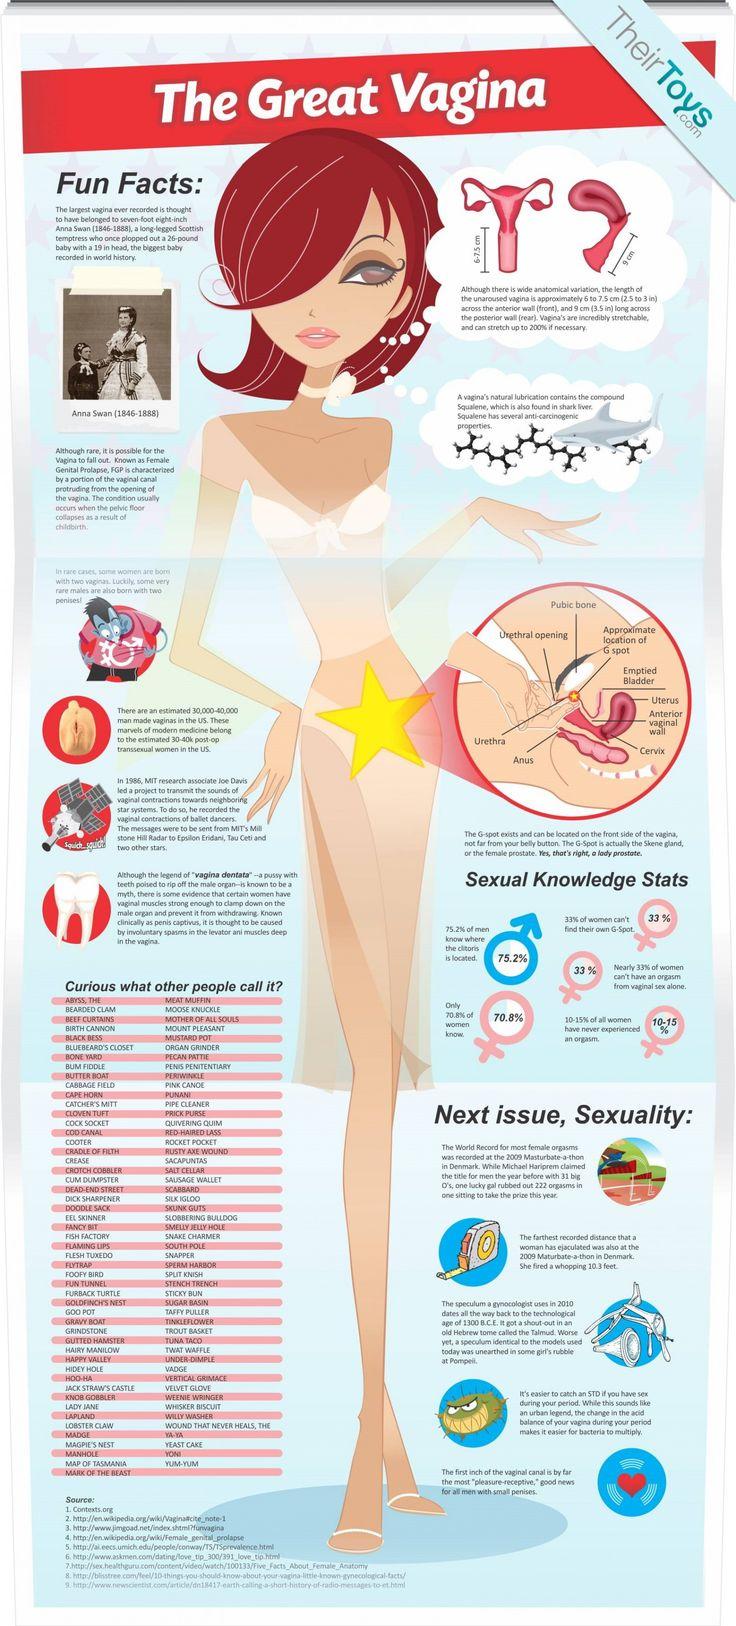 Tips for a healthy vagina. #femalehealth, #healthyvagina